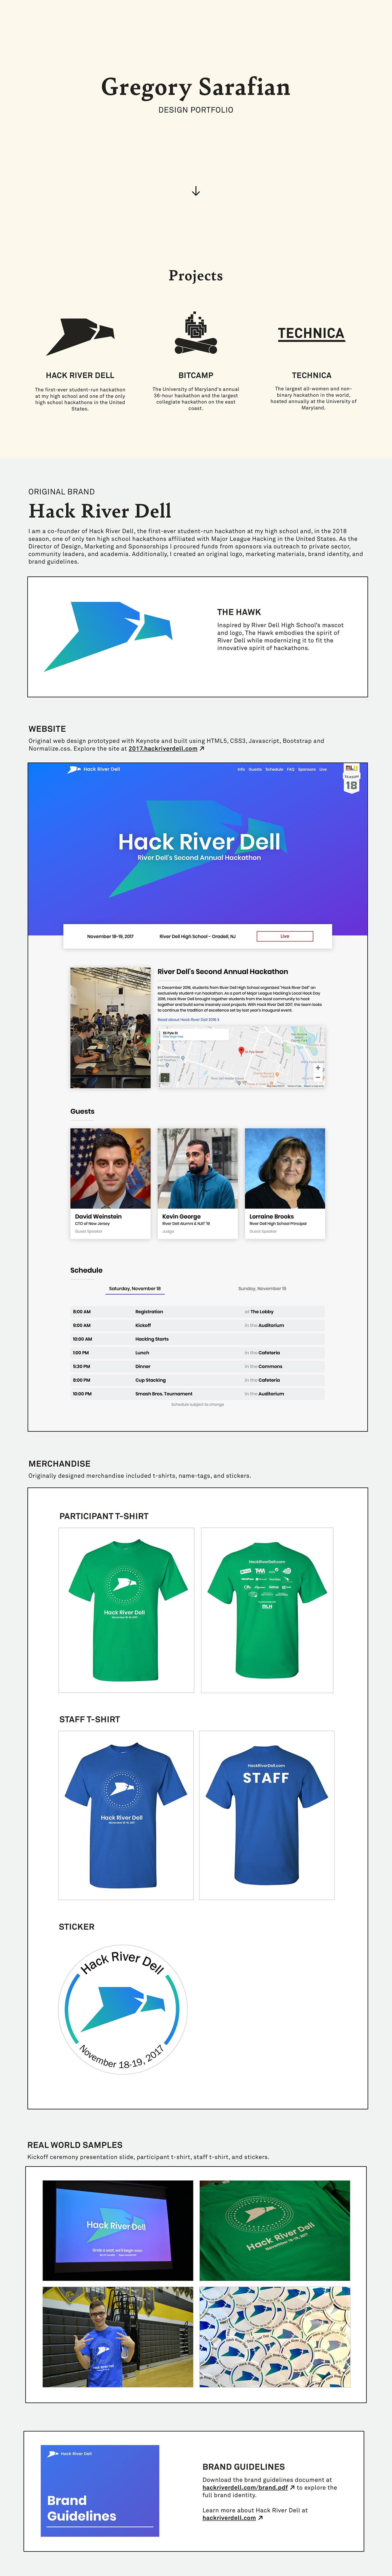 Sarafian Gregory Sarafian Greg Sarafian bitcamp technica hack river dell UI/UX apple portfolio design